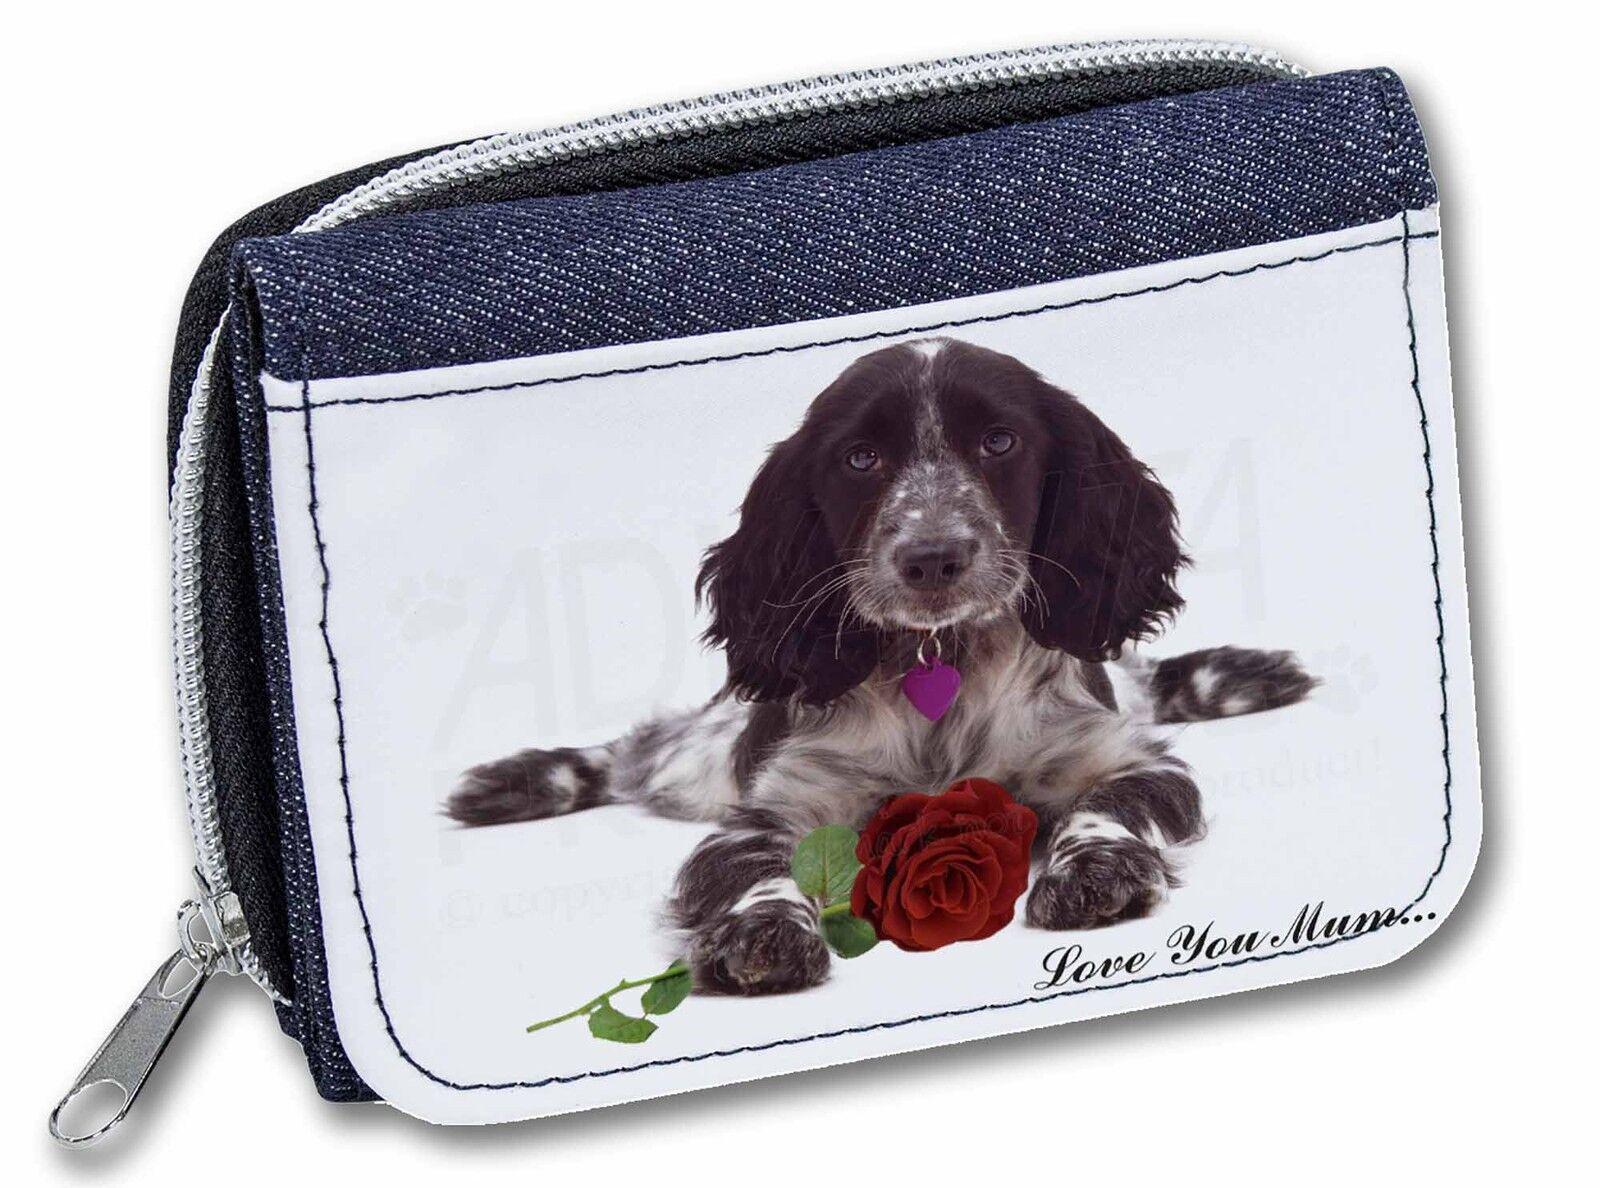 Cocker+Rose 'Love You Mum' Girls/Ladies Denim Purse Wallet Christ, AD-SC13RlymJW